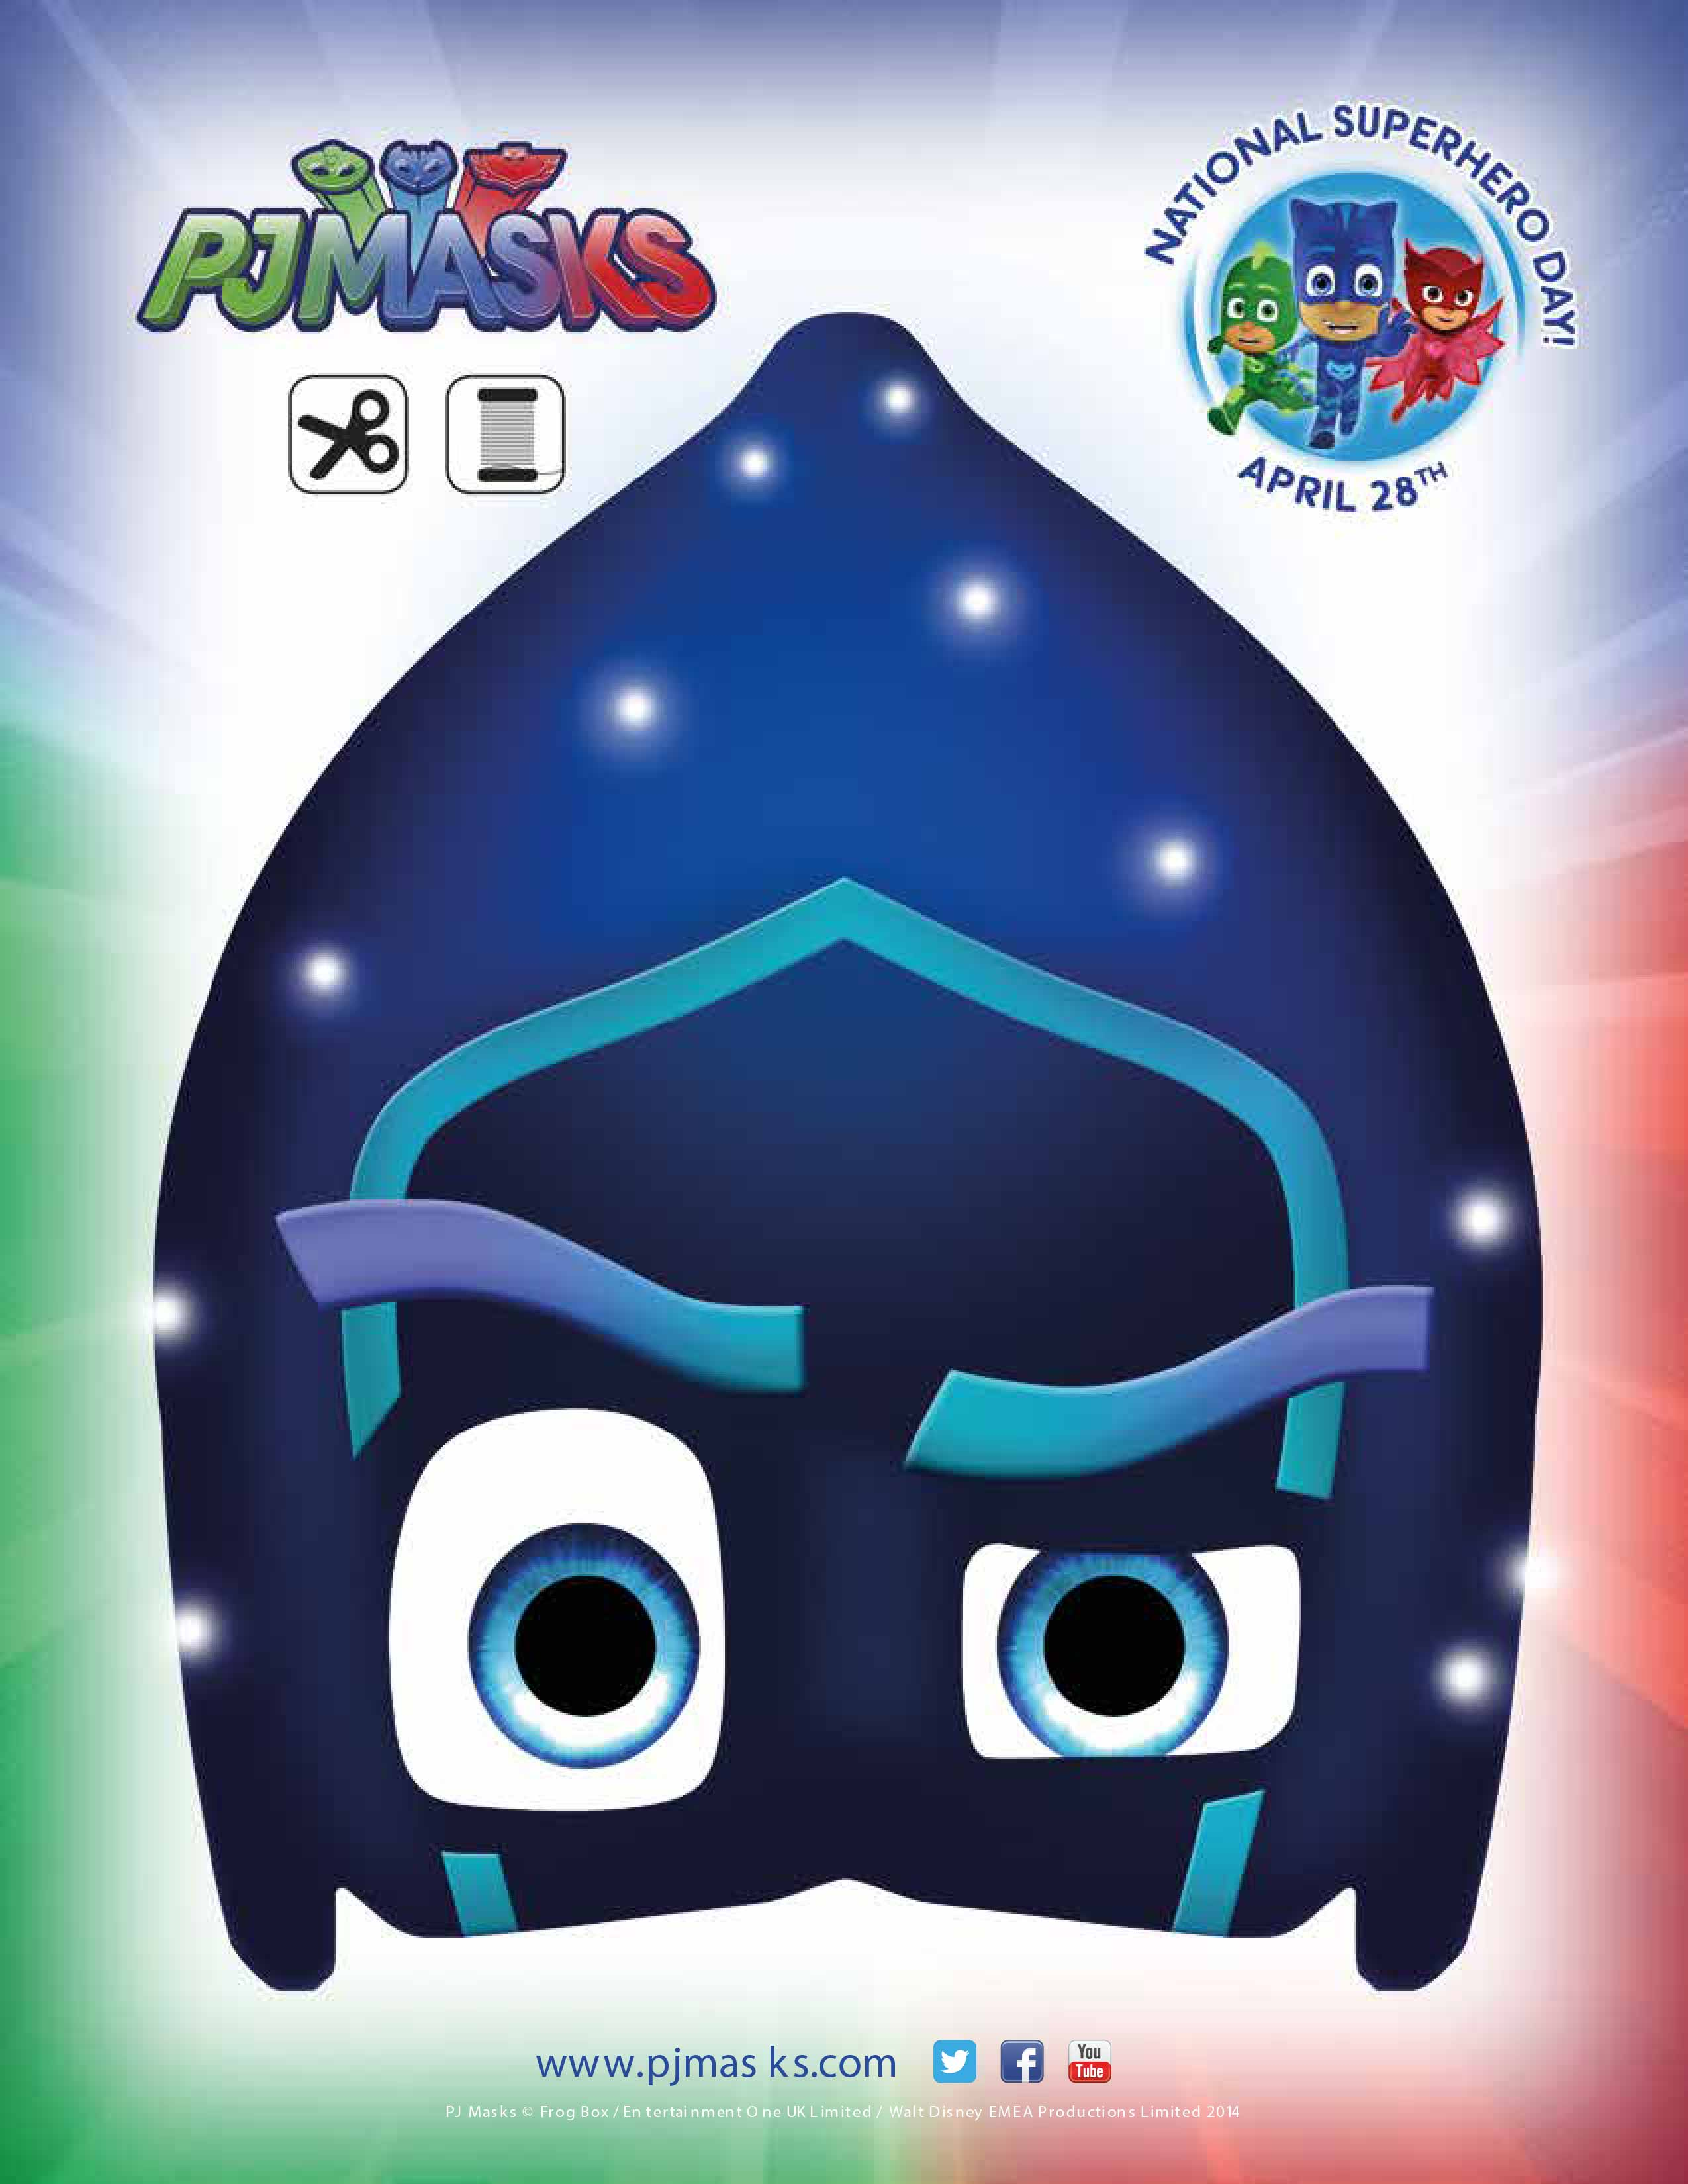 photo regarding Pj Mask Printable Template referred to as PJ Masks Bash Printables for Totally free